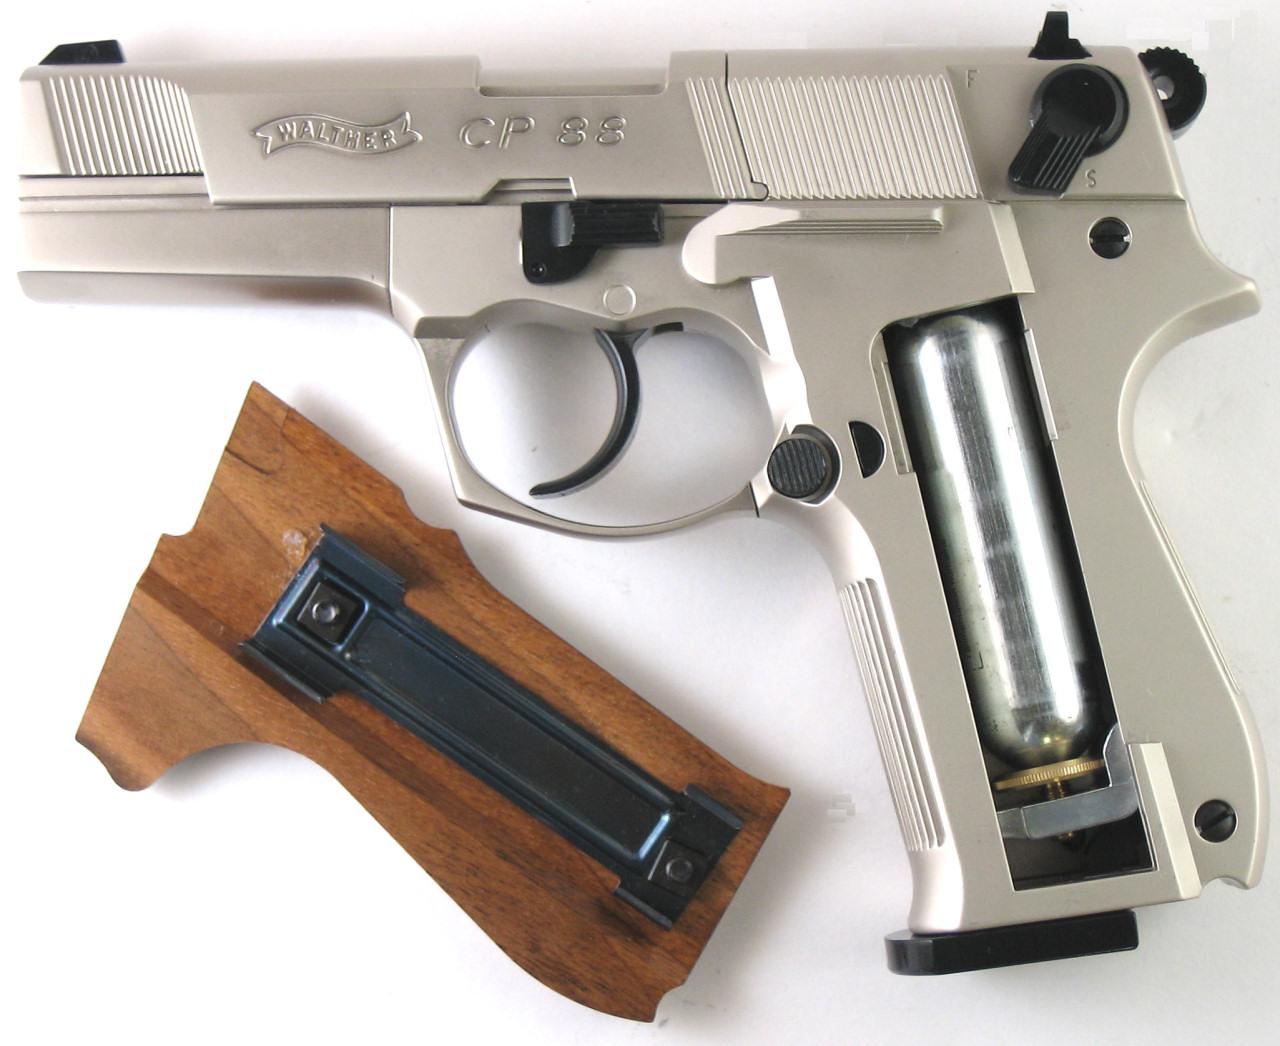 Modern Pentathlon at Olympics: Pistol and Ammo used in Olympic